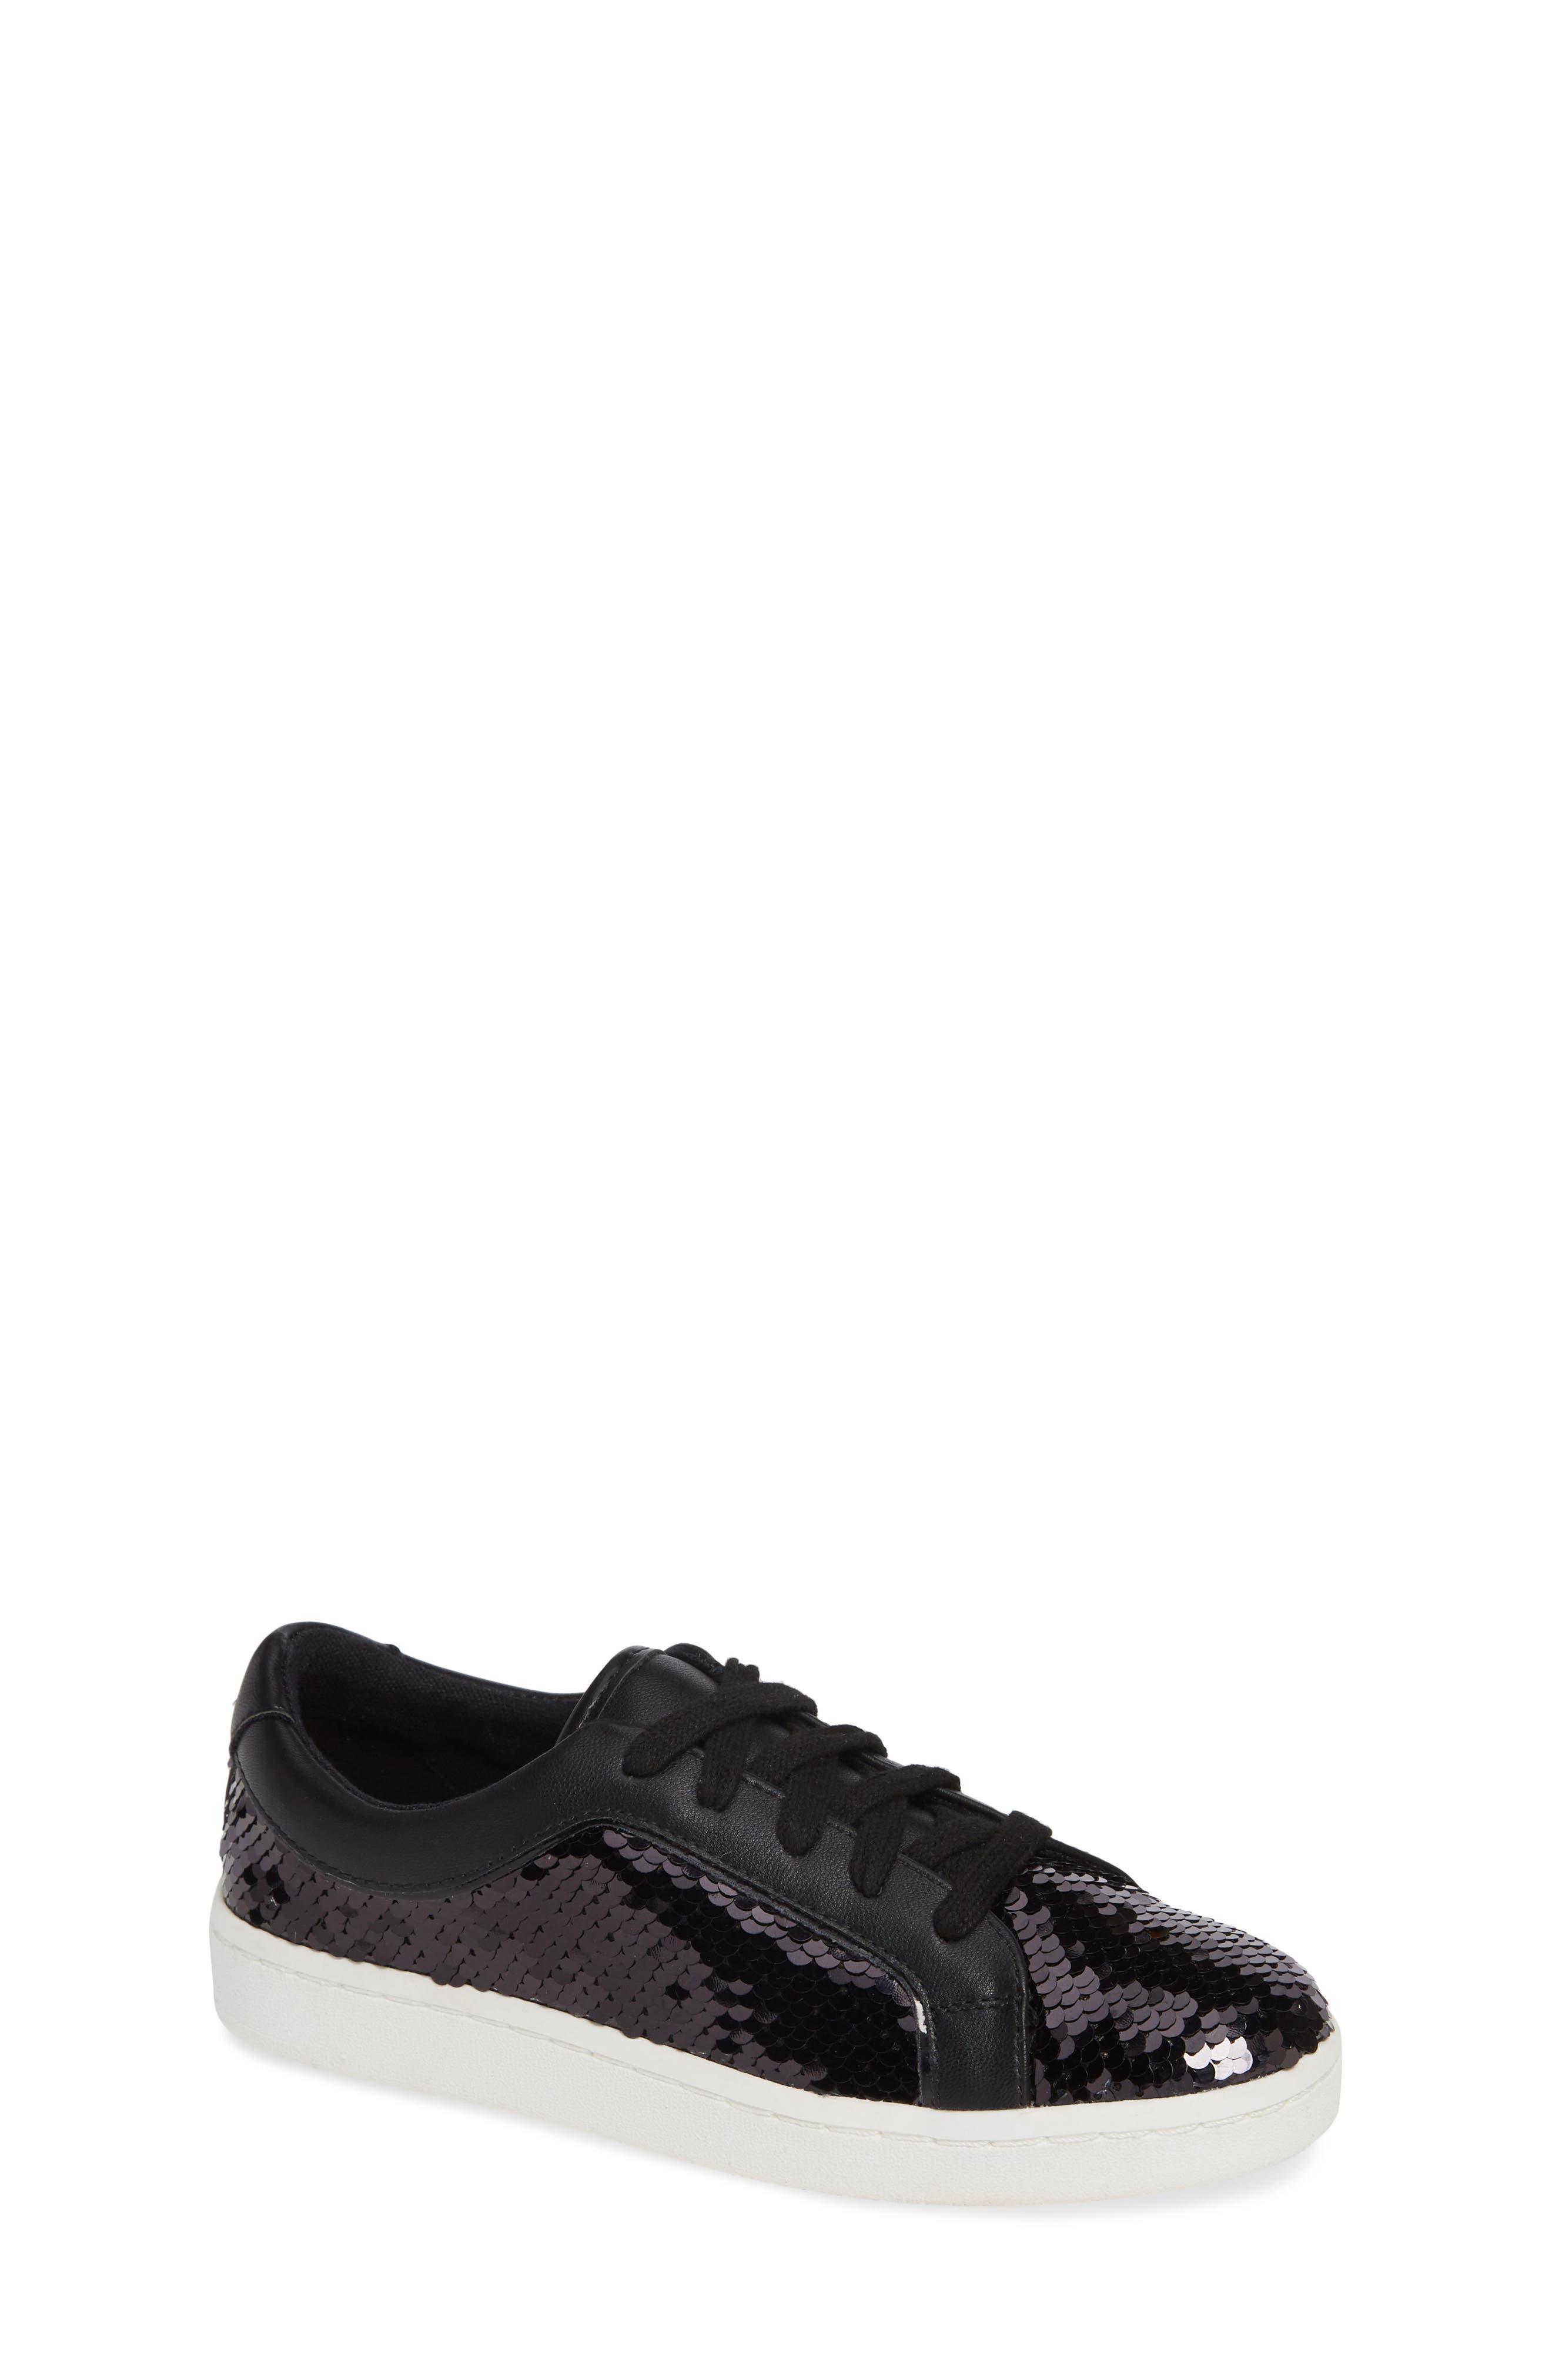 Blane Elizia Sequin Sneaker,                         Main,                         color, BLACK SILVER